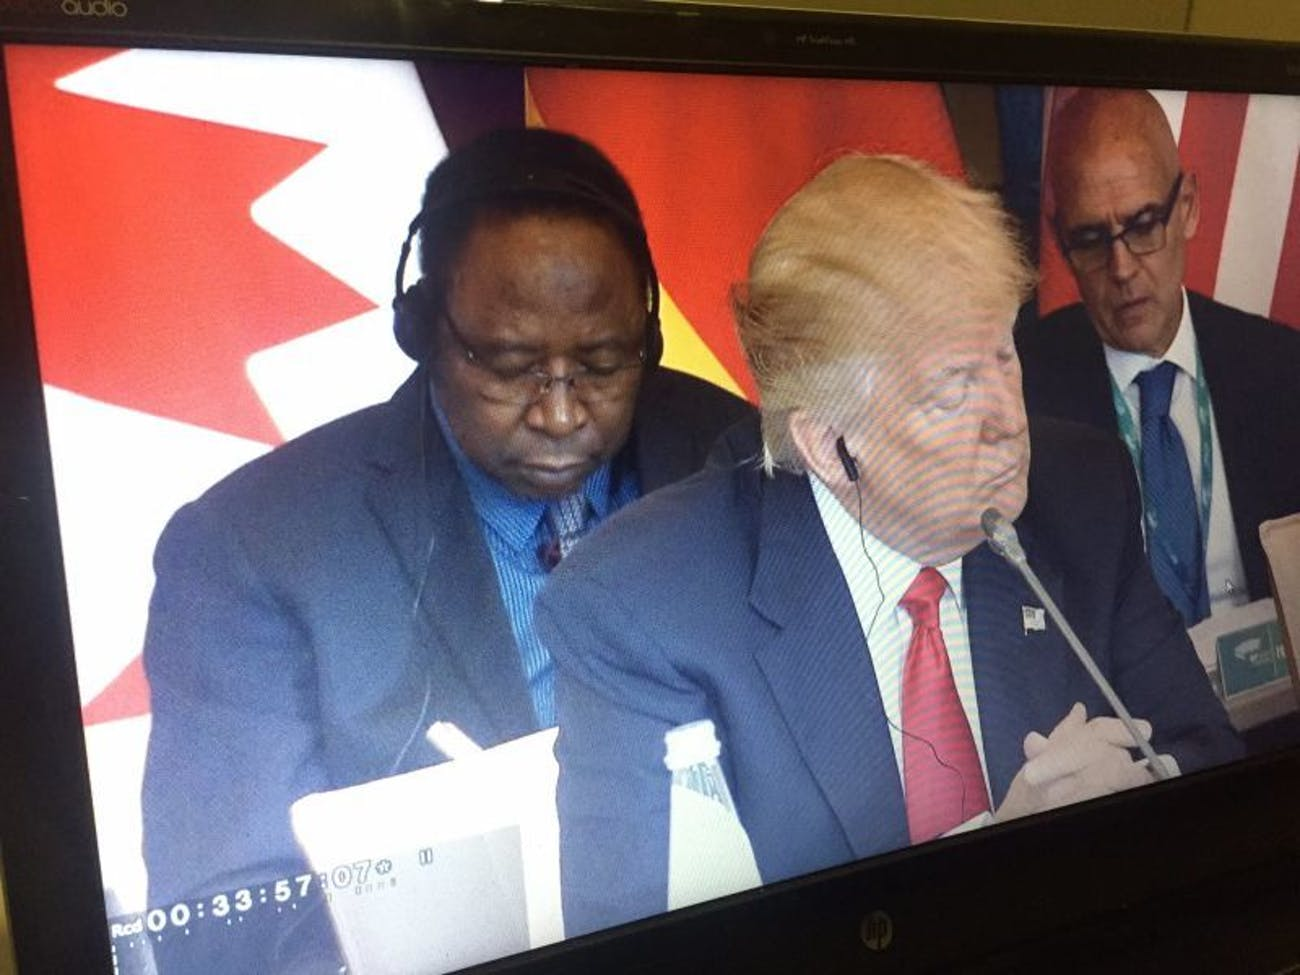 Trump earpiece in